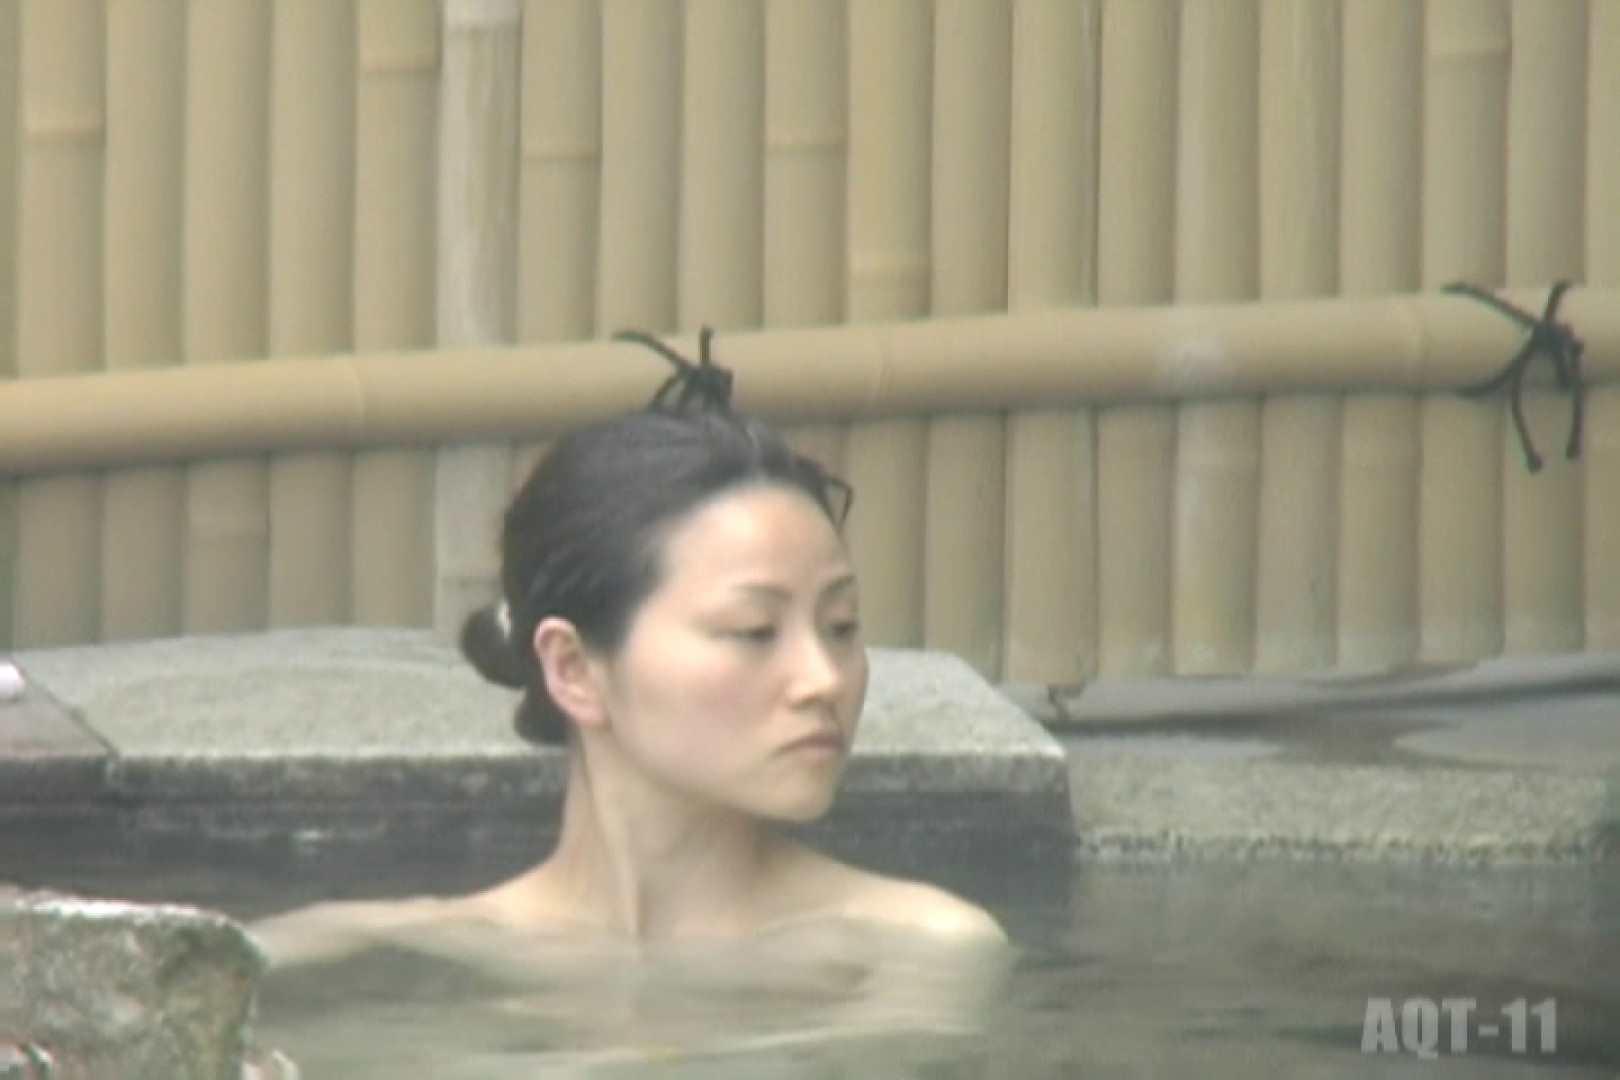 Aquaな露天風呂Vol.802 女体盗撮 盗み撮りSEX無修正画像 85連発 35